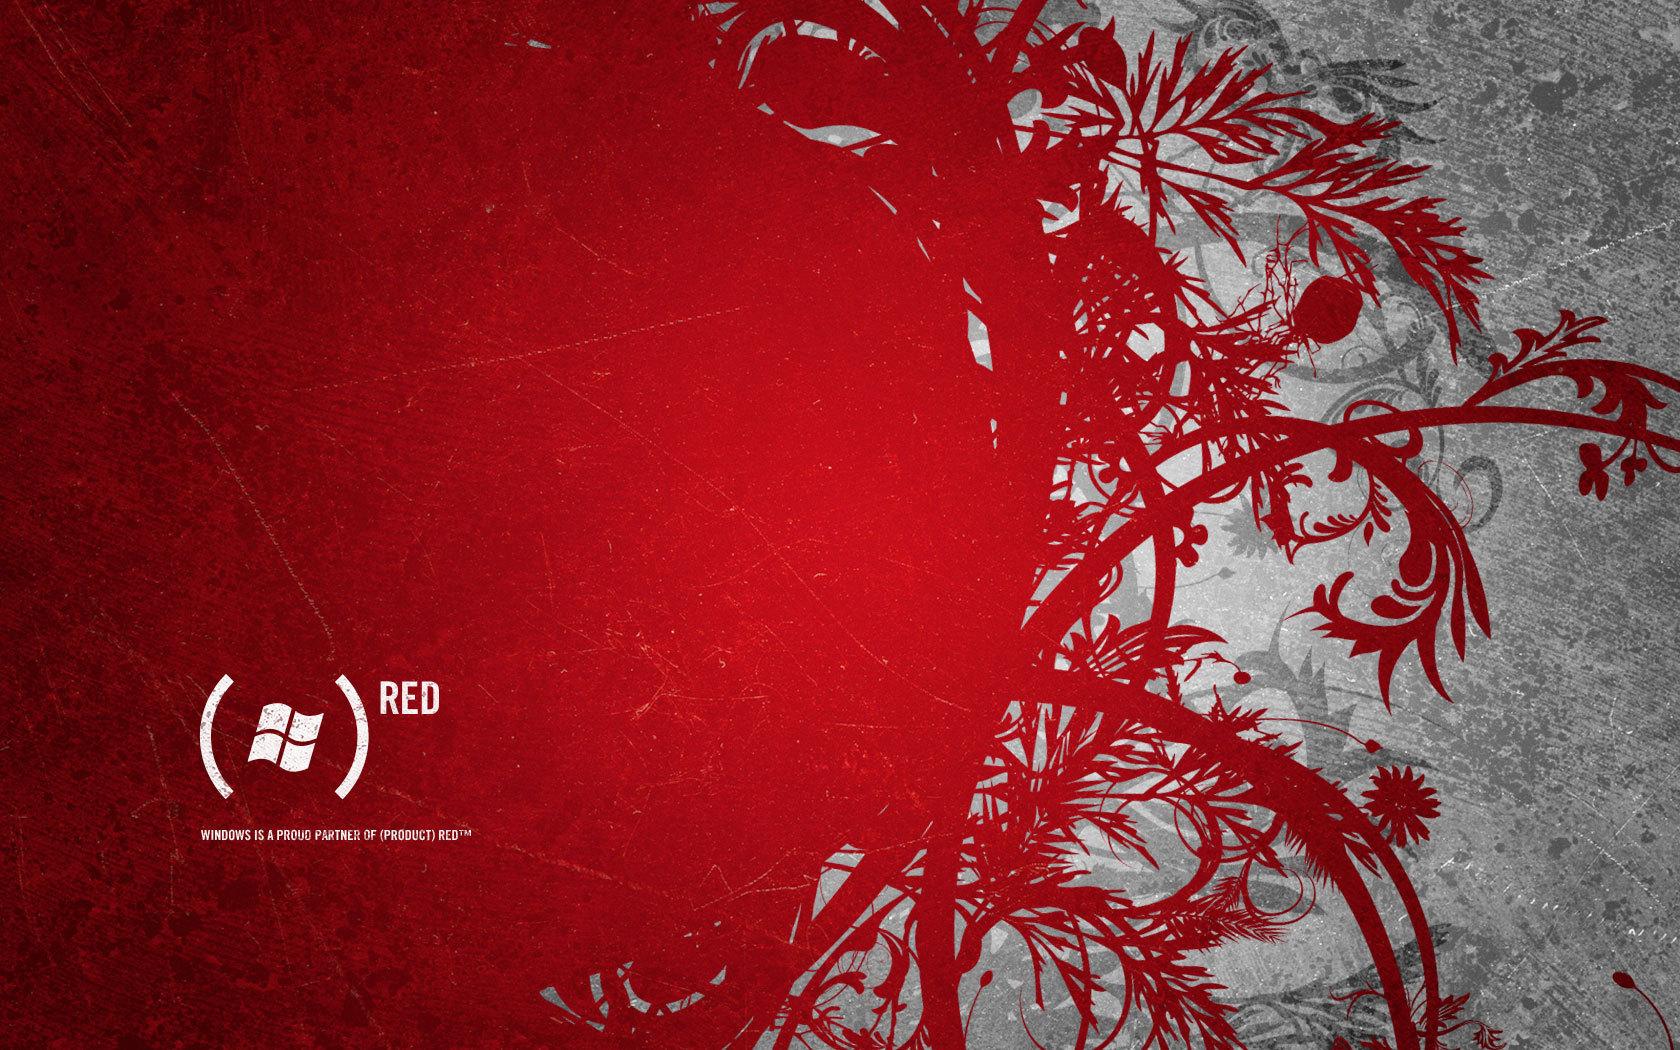 red desktop wallpaper download - photo #19